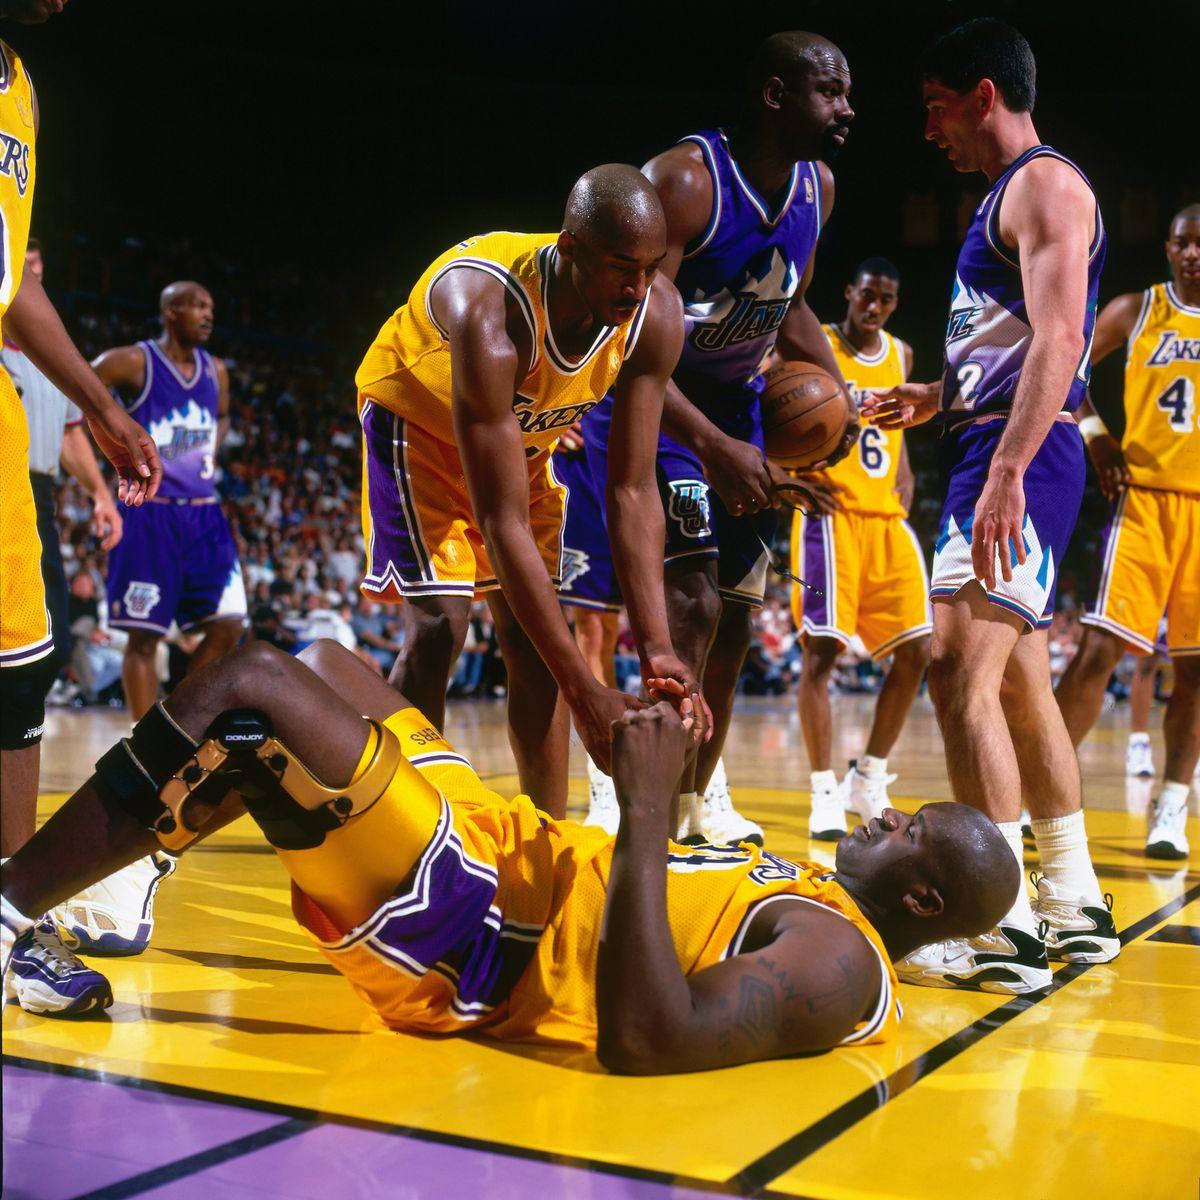 1997 Western Conference Semifinals, Game 4: Utah Jazz vs. Los Angeles Lakers